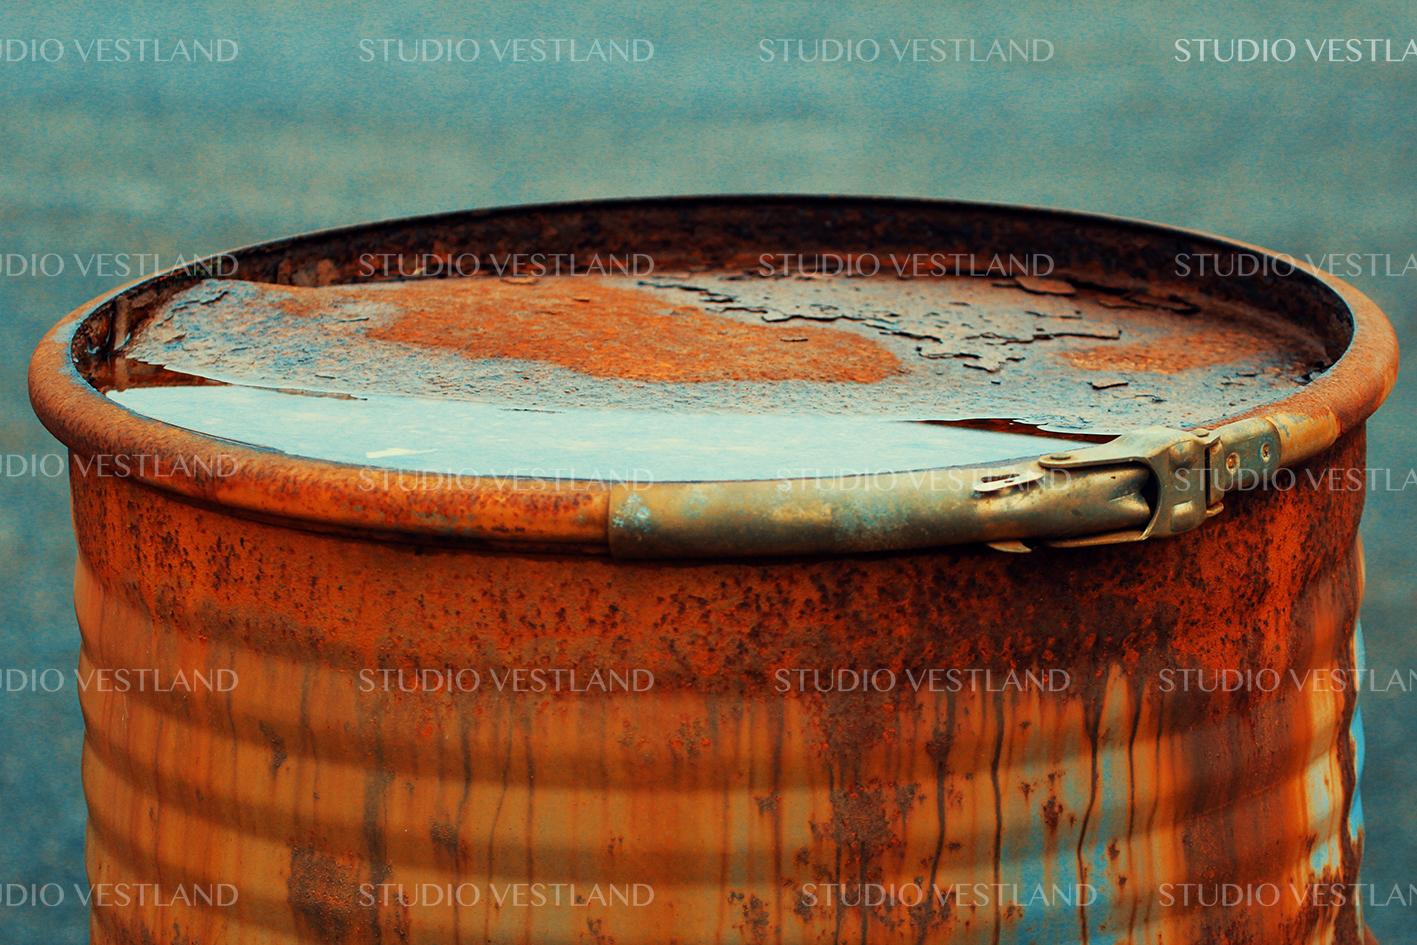 Studio Vestland - Barrel 02